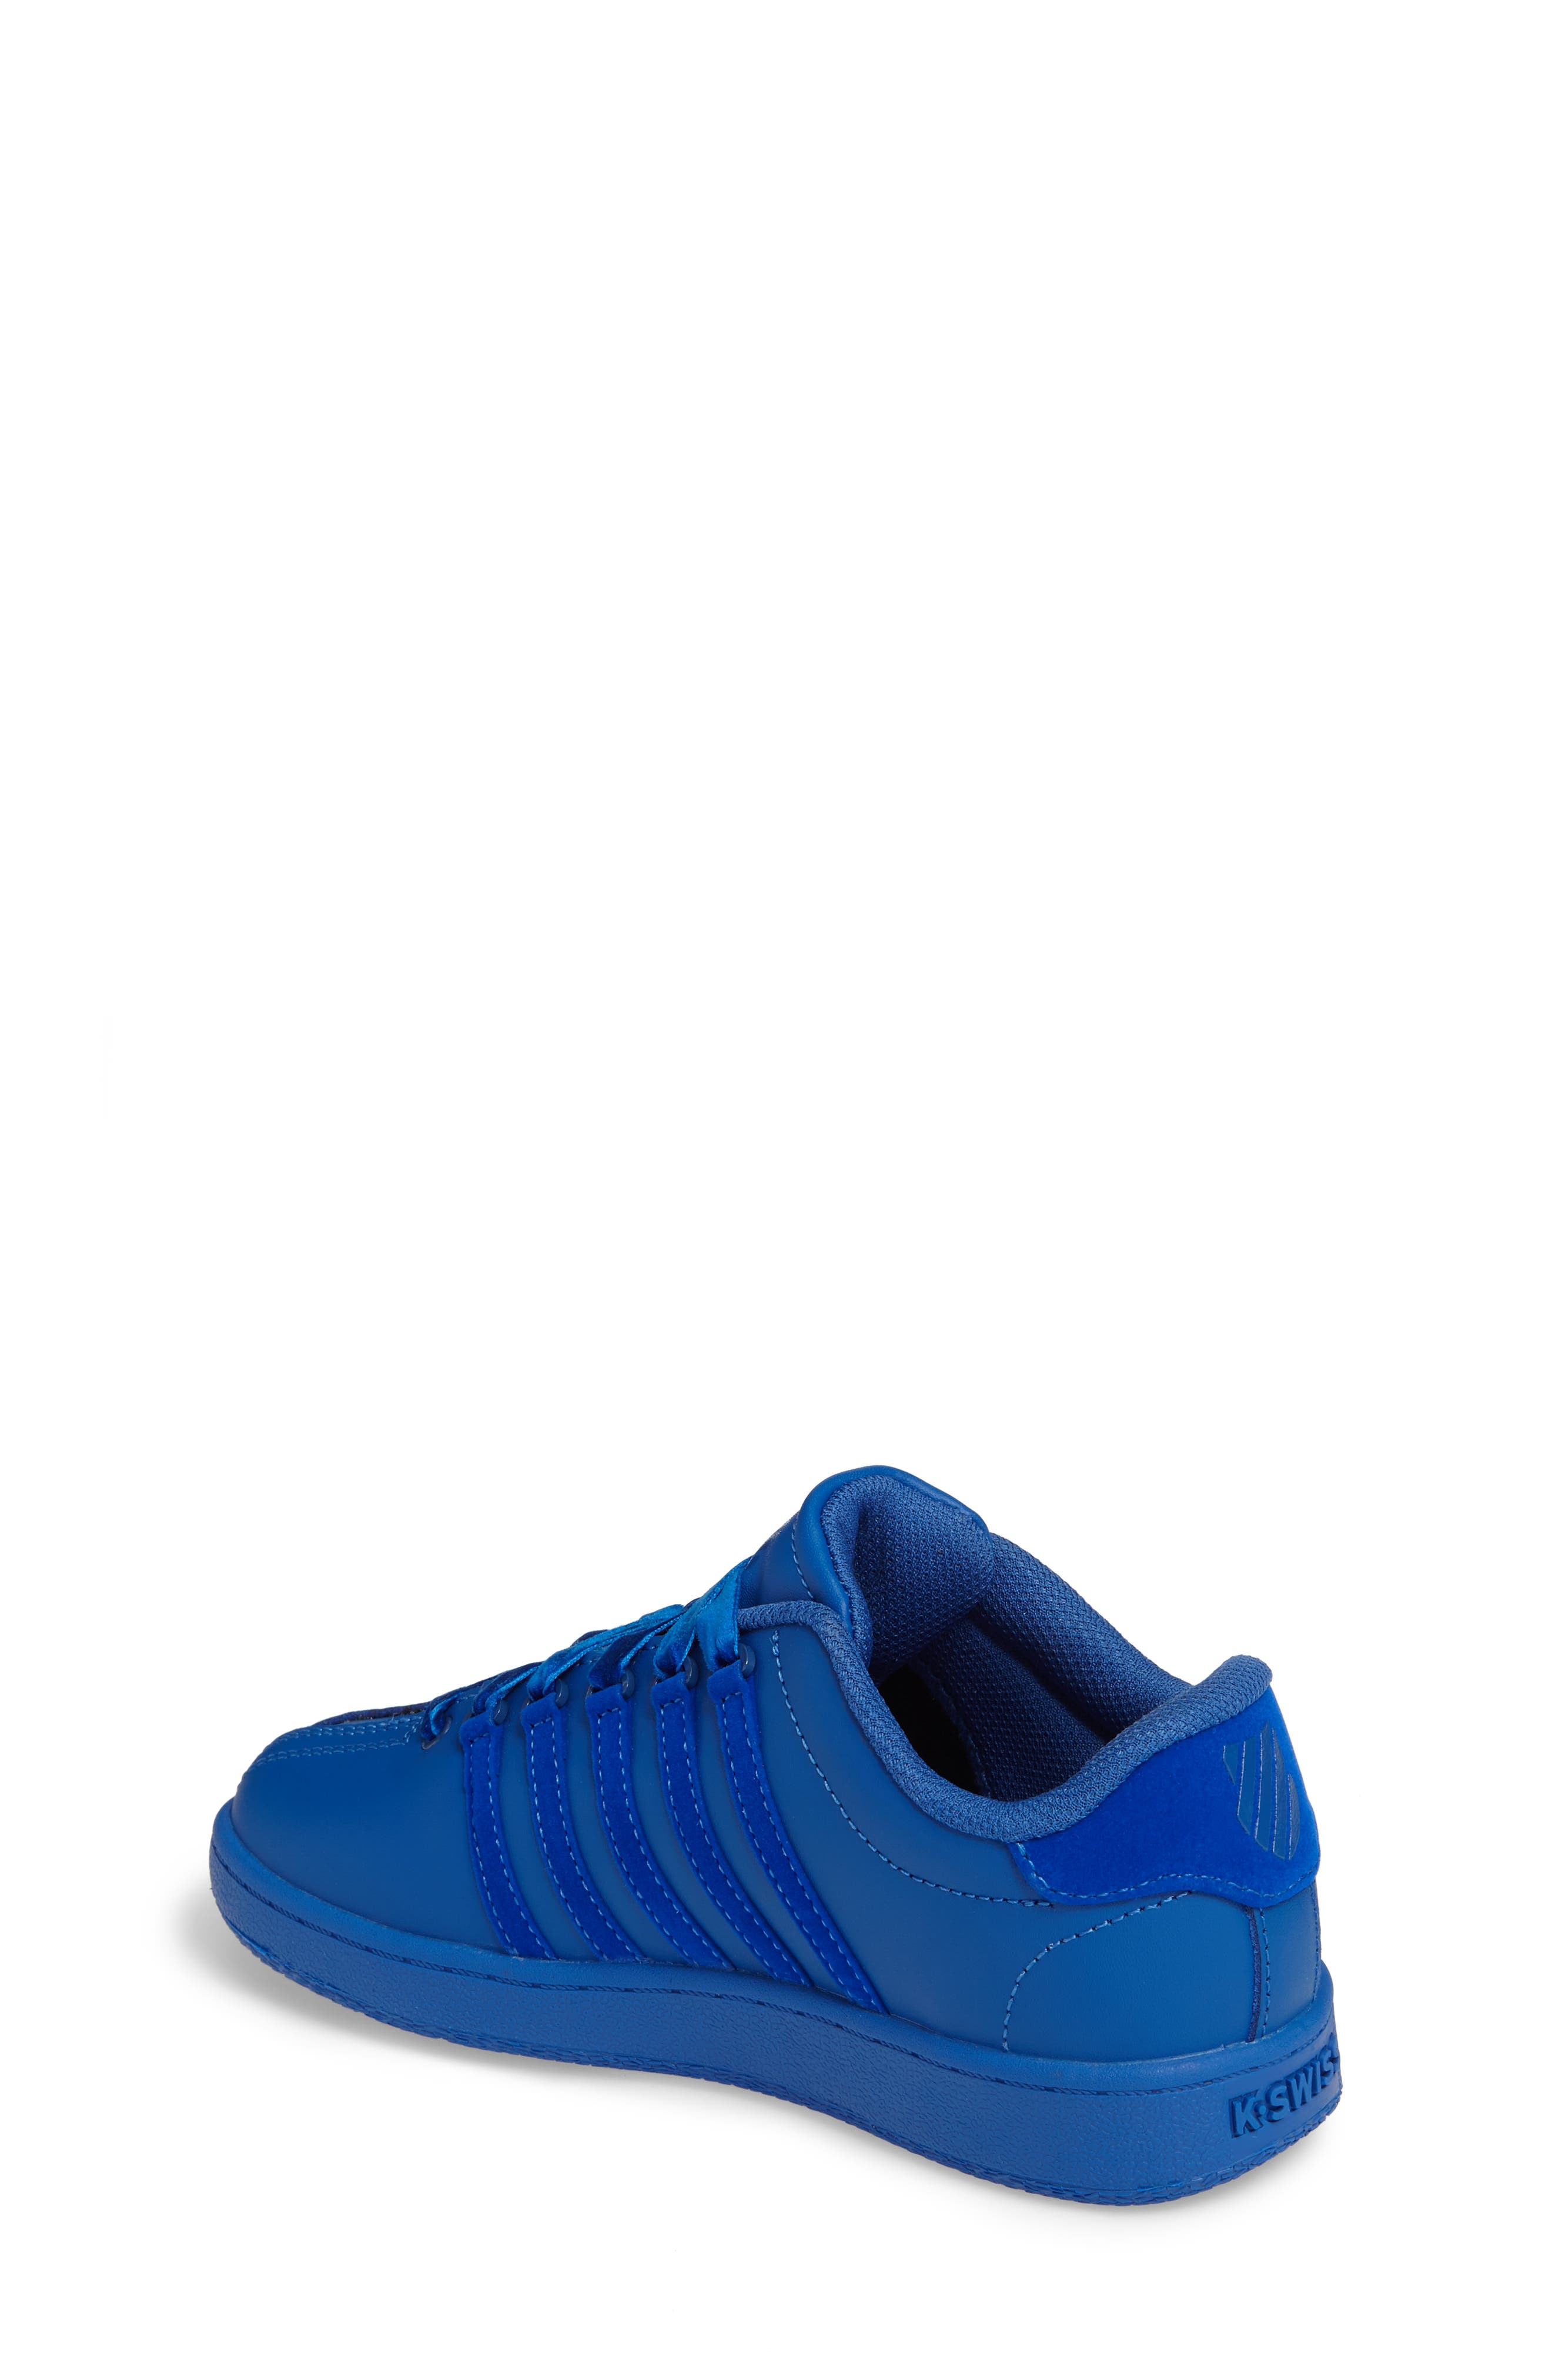 Alternate Image 2  - K-Swiss Classic VN Sneaker (Big Kid)